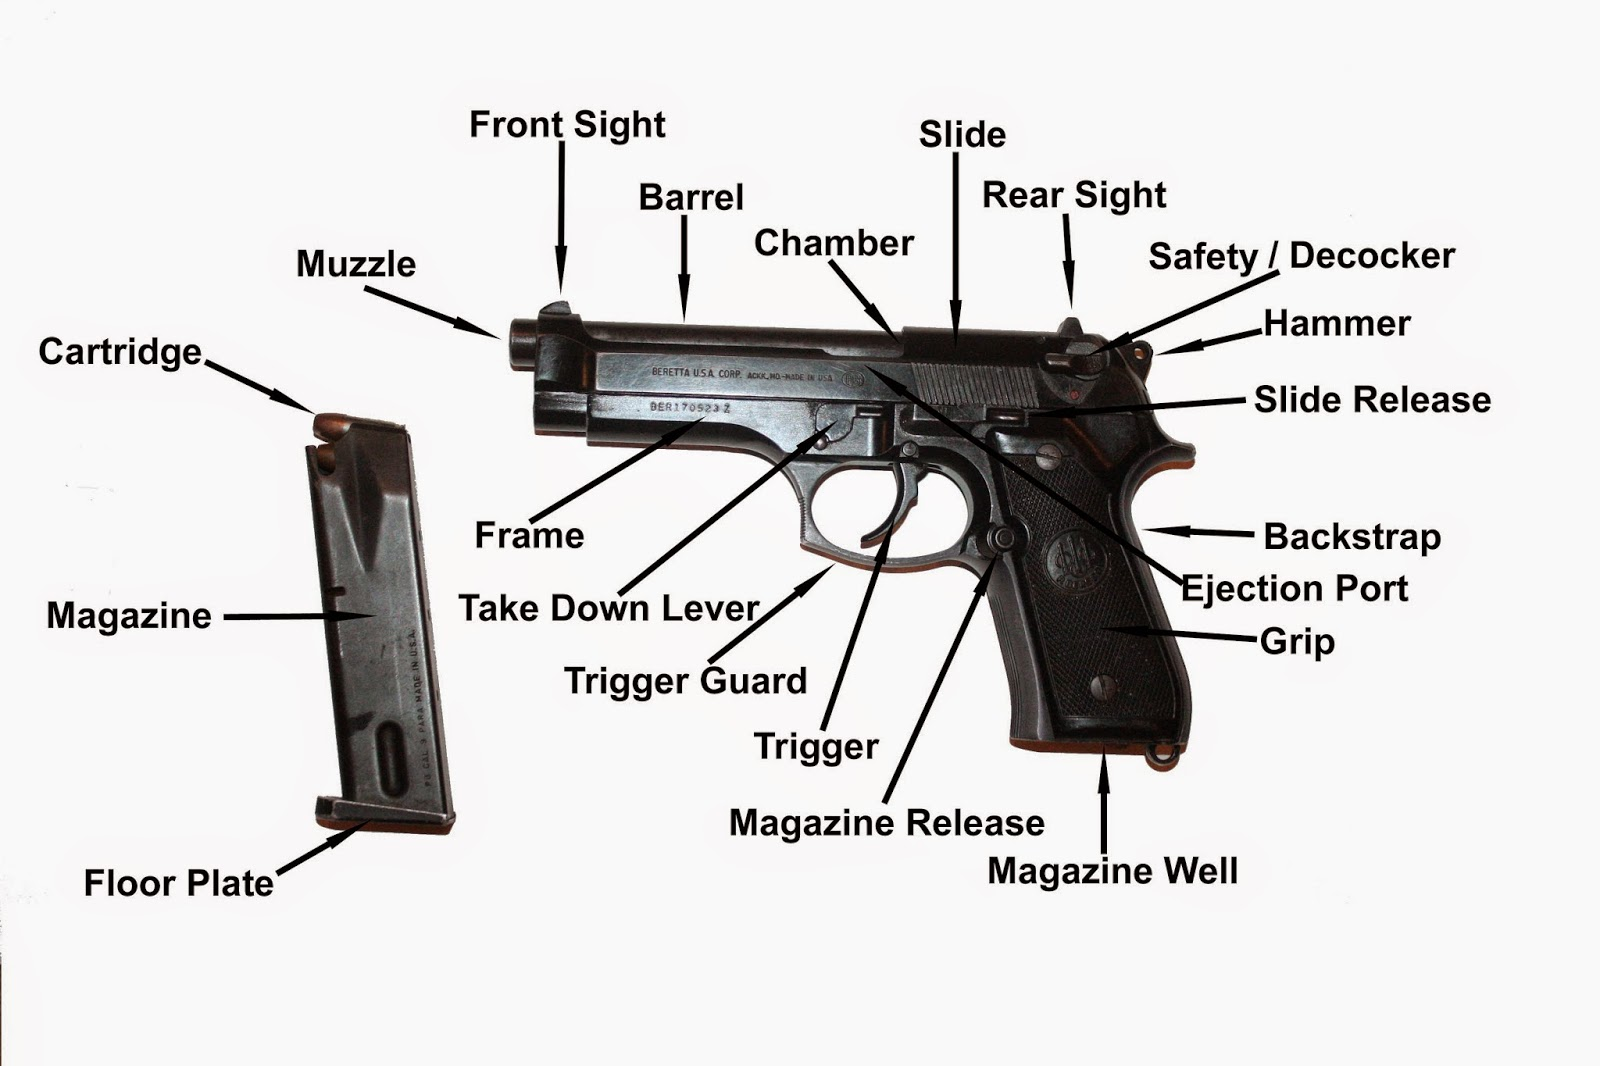 generic semi auto handgun parts diagram marine dual battery switch wiring righting crime fiction automatic pistol basics